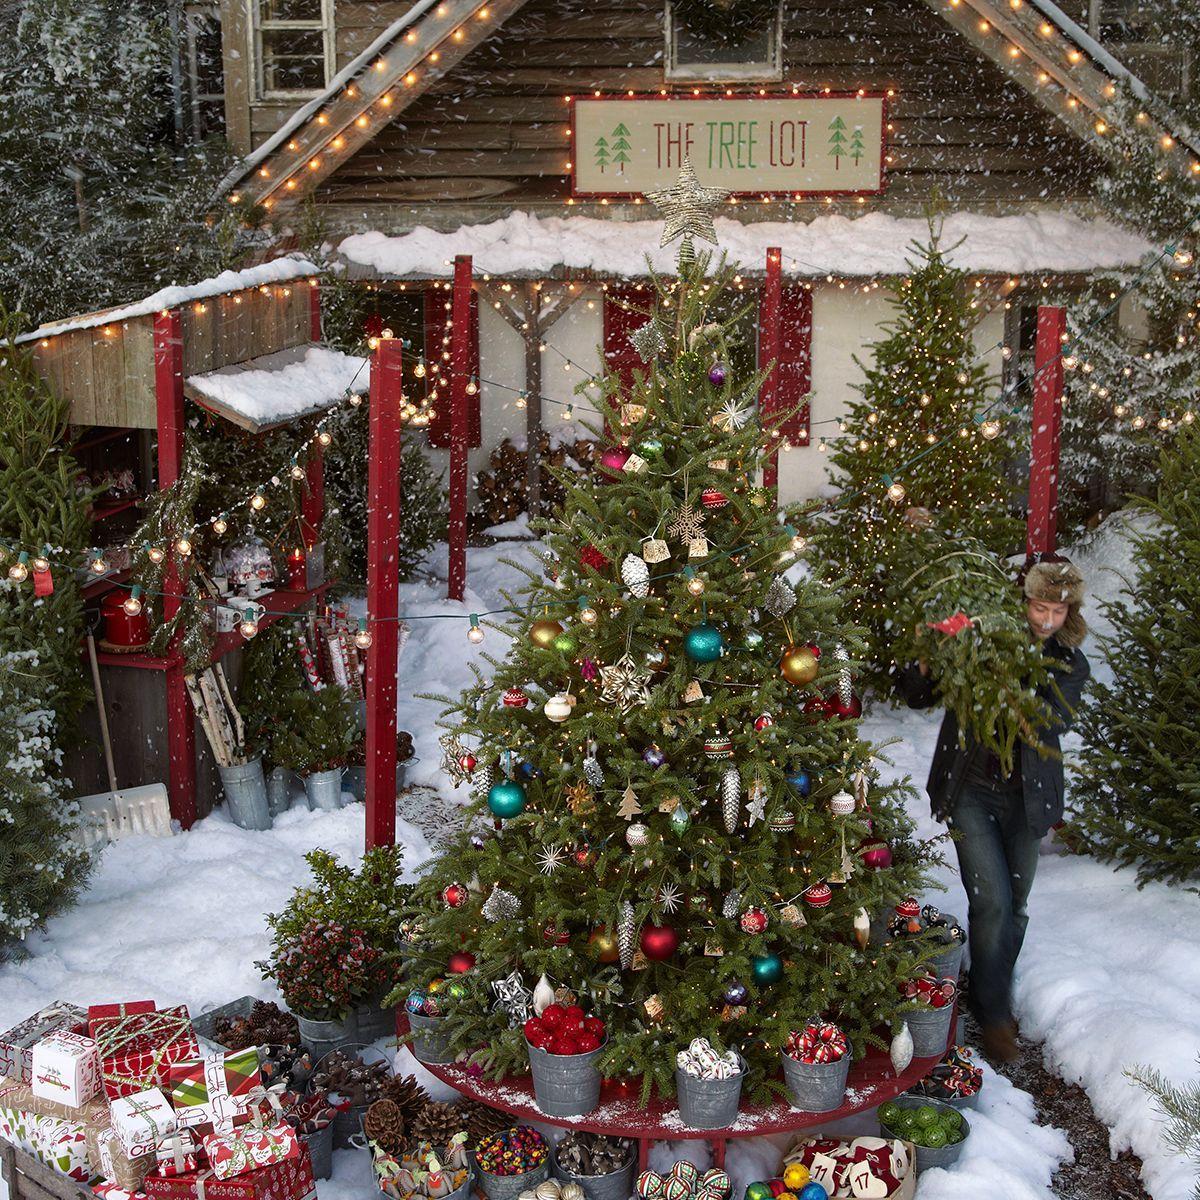 Take A Trip To The Treelot Christmas Tree Lots Christmas Tree Farm Christmas Magic